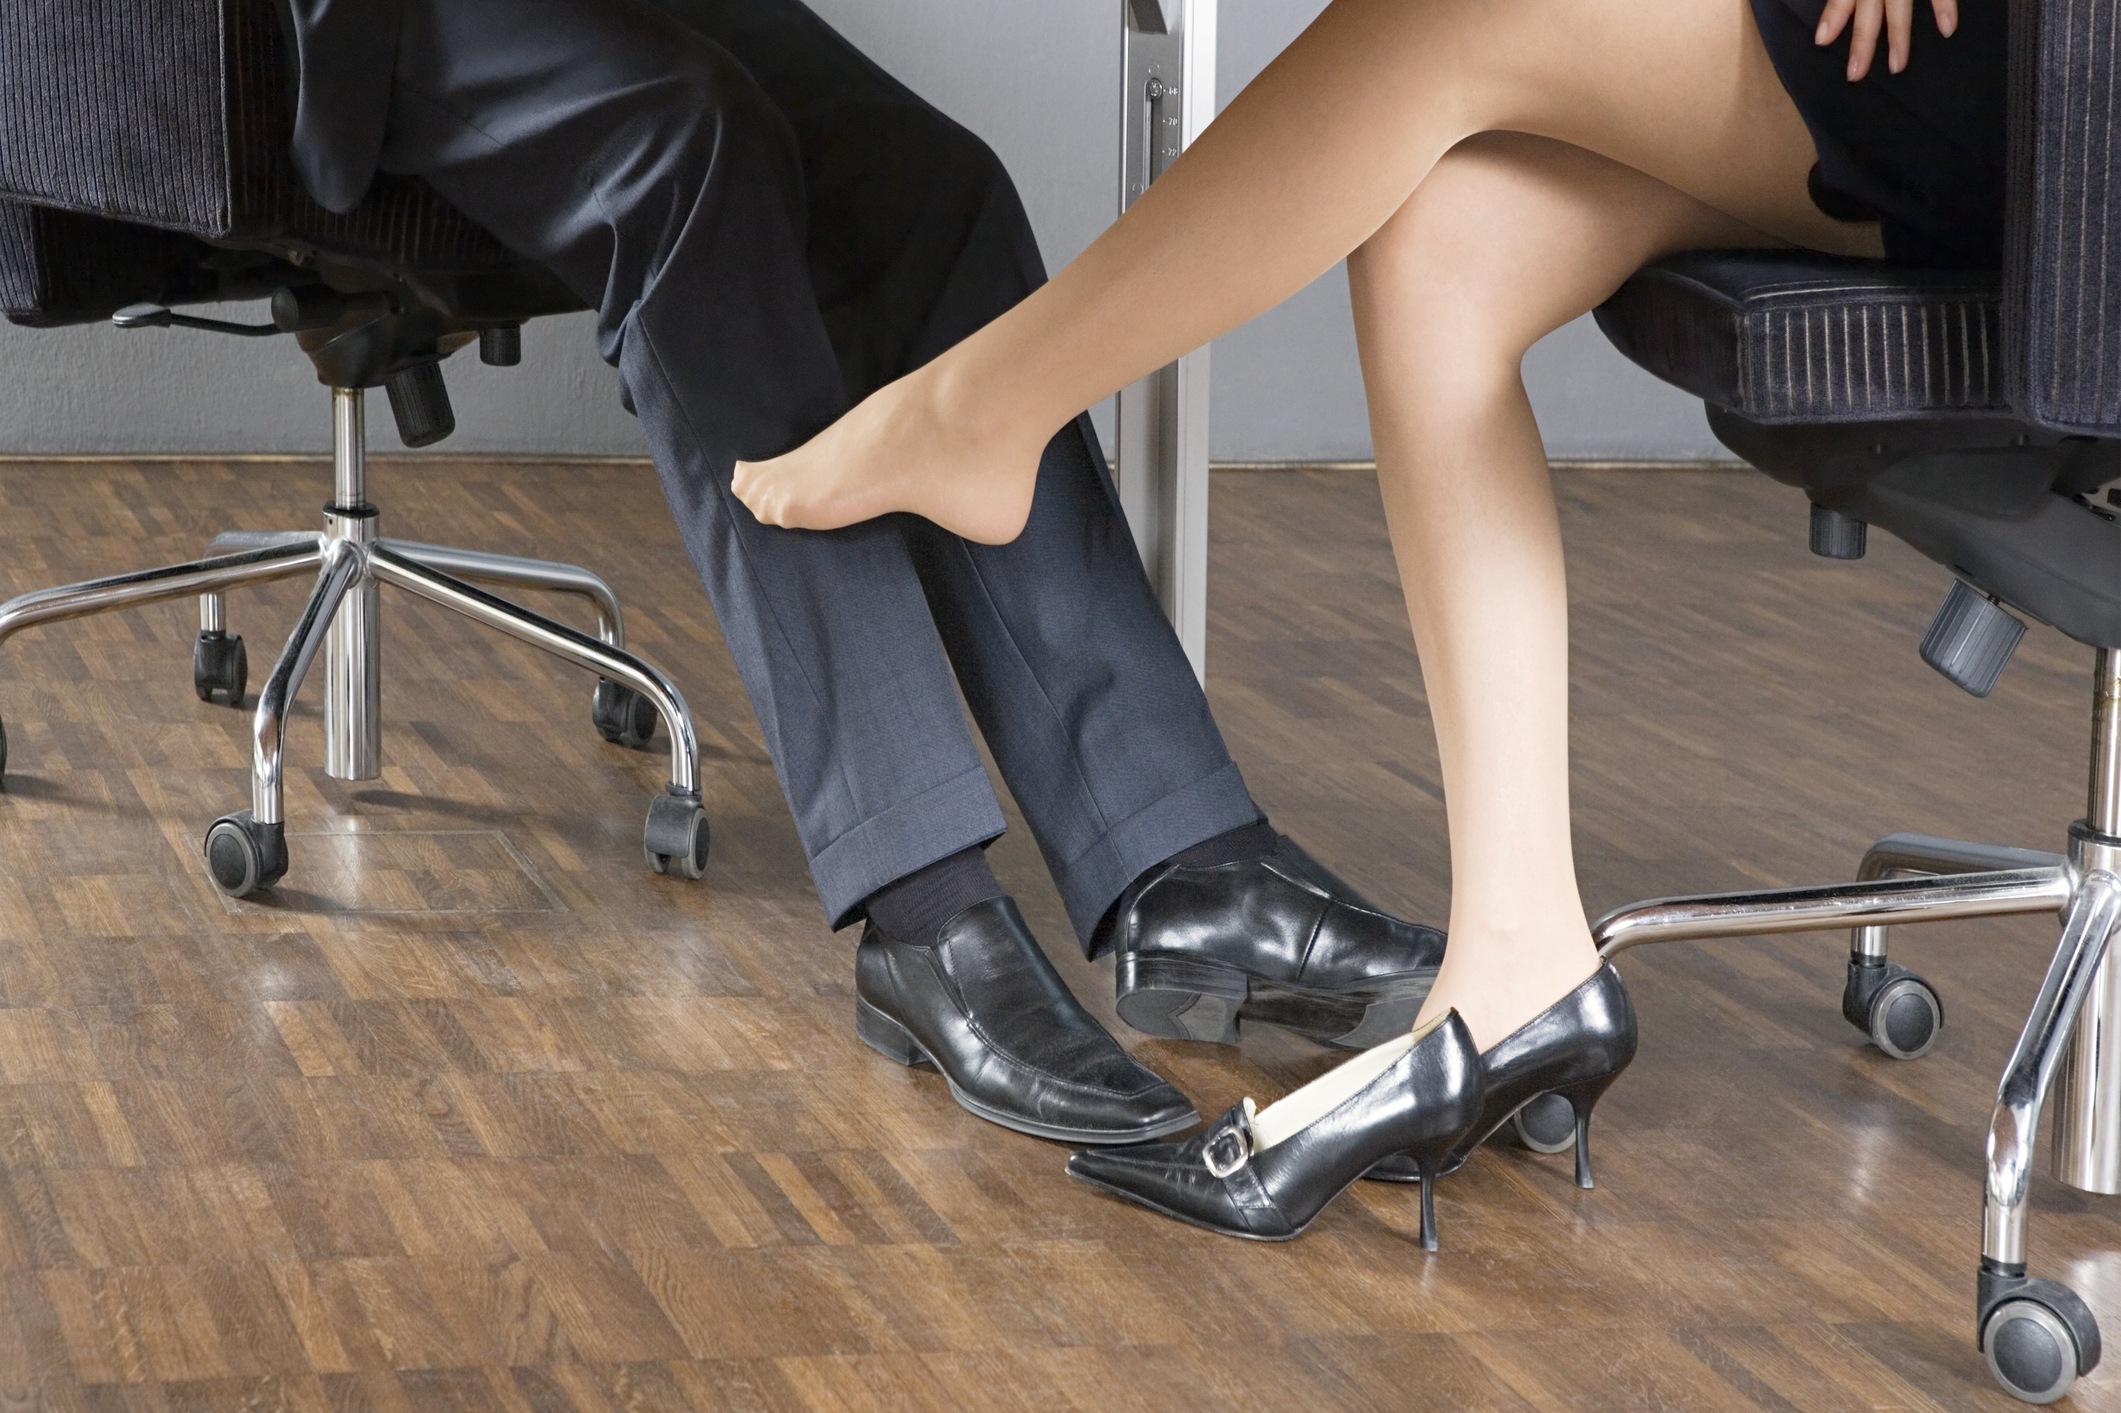 Woman flirting at work